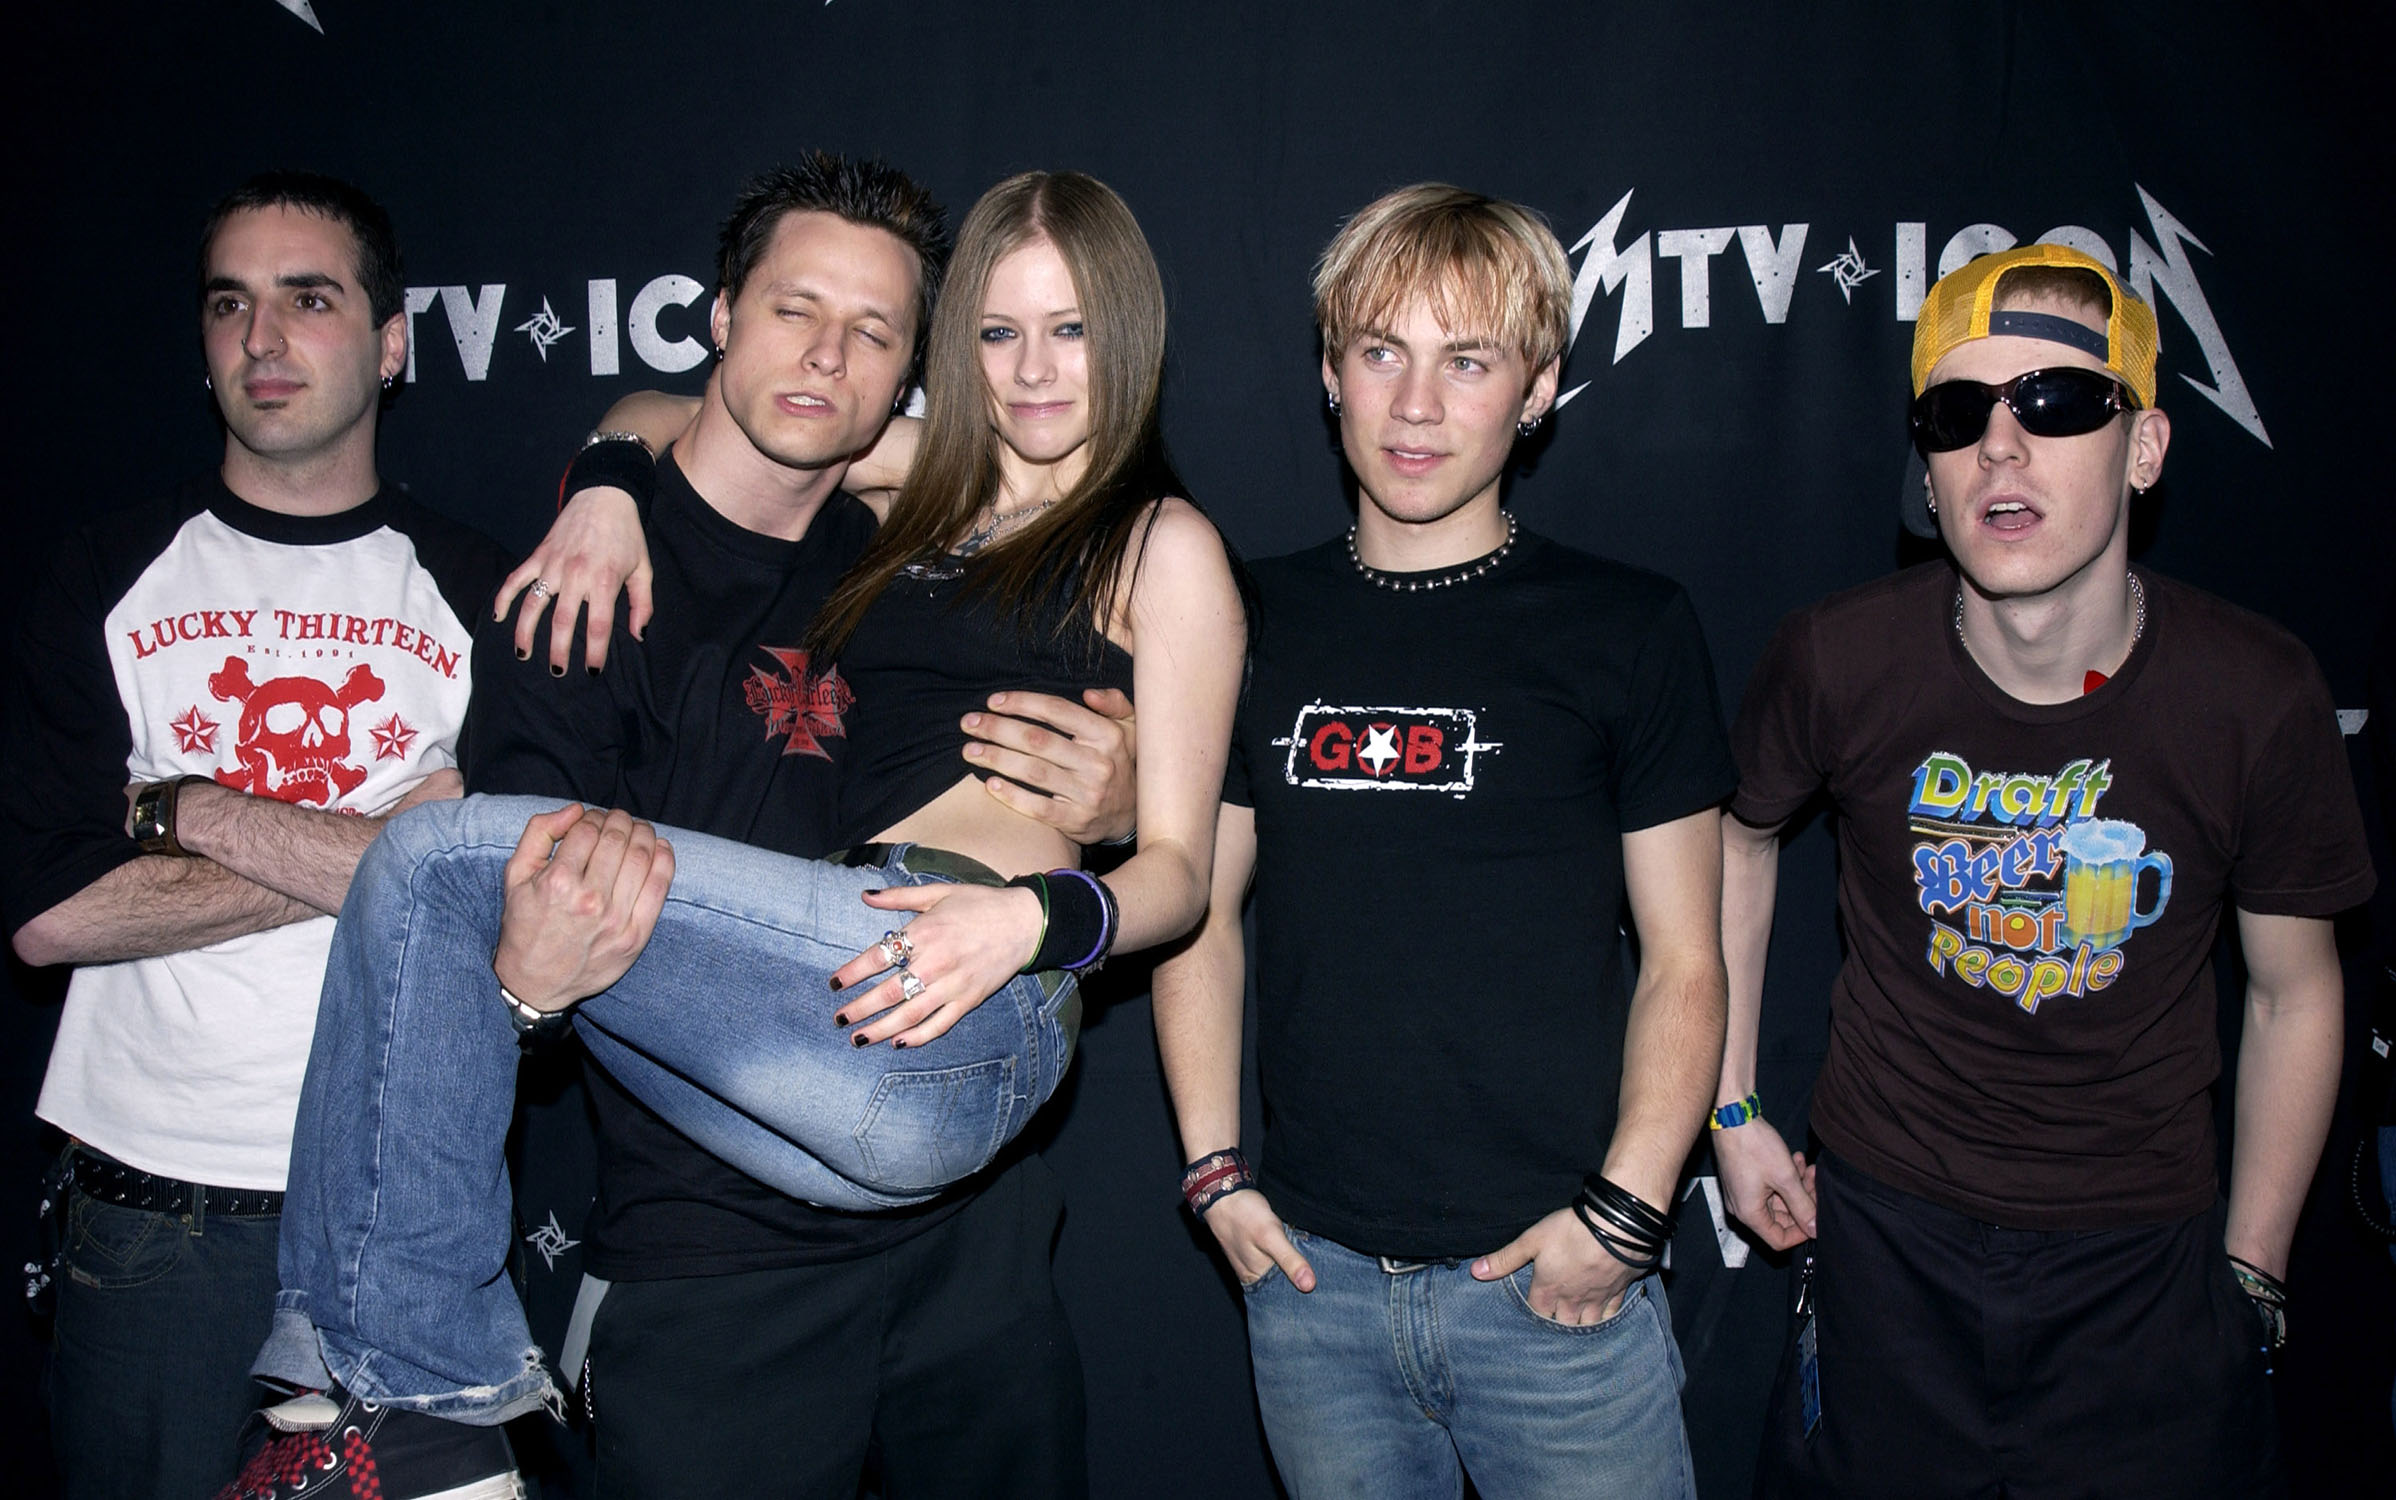 MTV Icon - Metallica 03.05.03